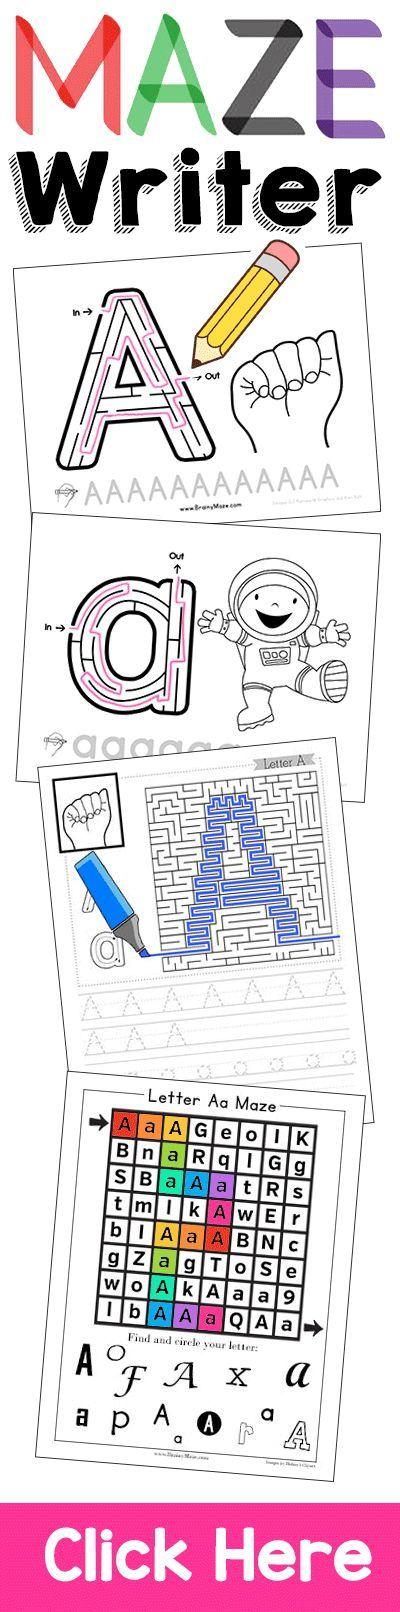 maze writer handwriting program free homeschool. Black Bedroom Furniture Sets. Home Design Ideas